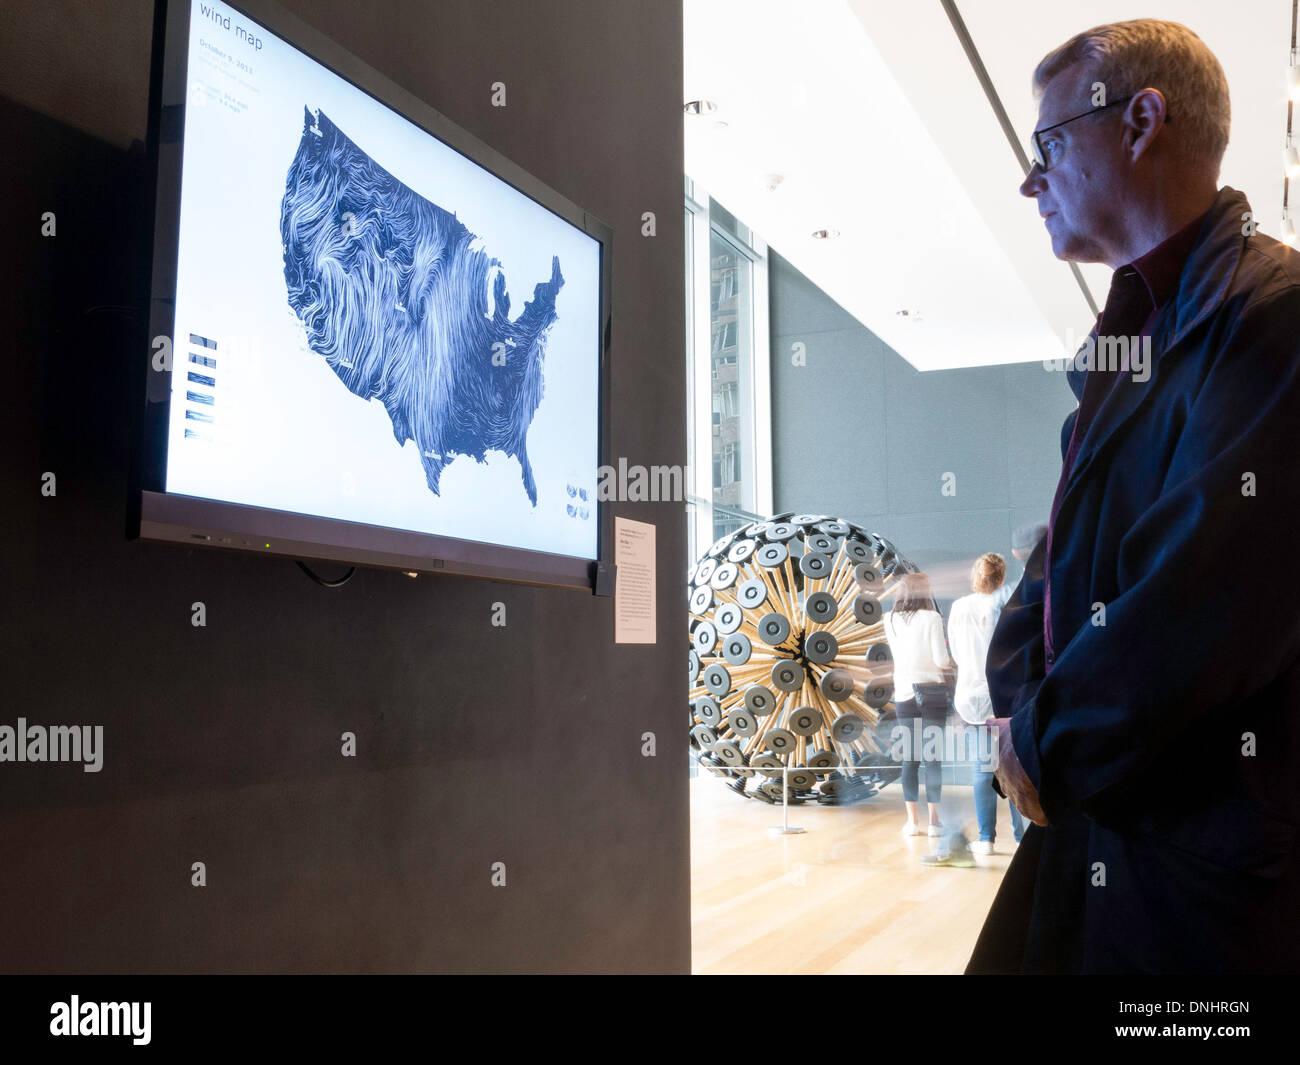 Patron Views Wind Map Display Museum Of Modern Art Nyc